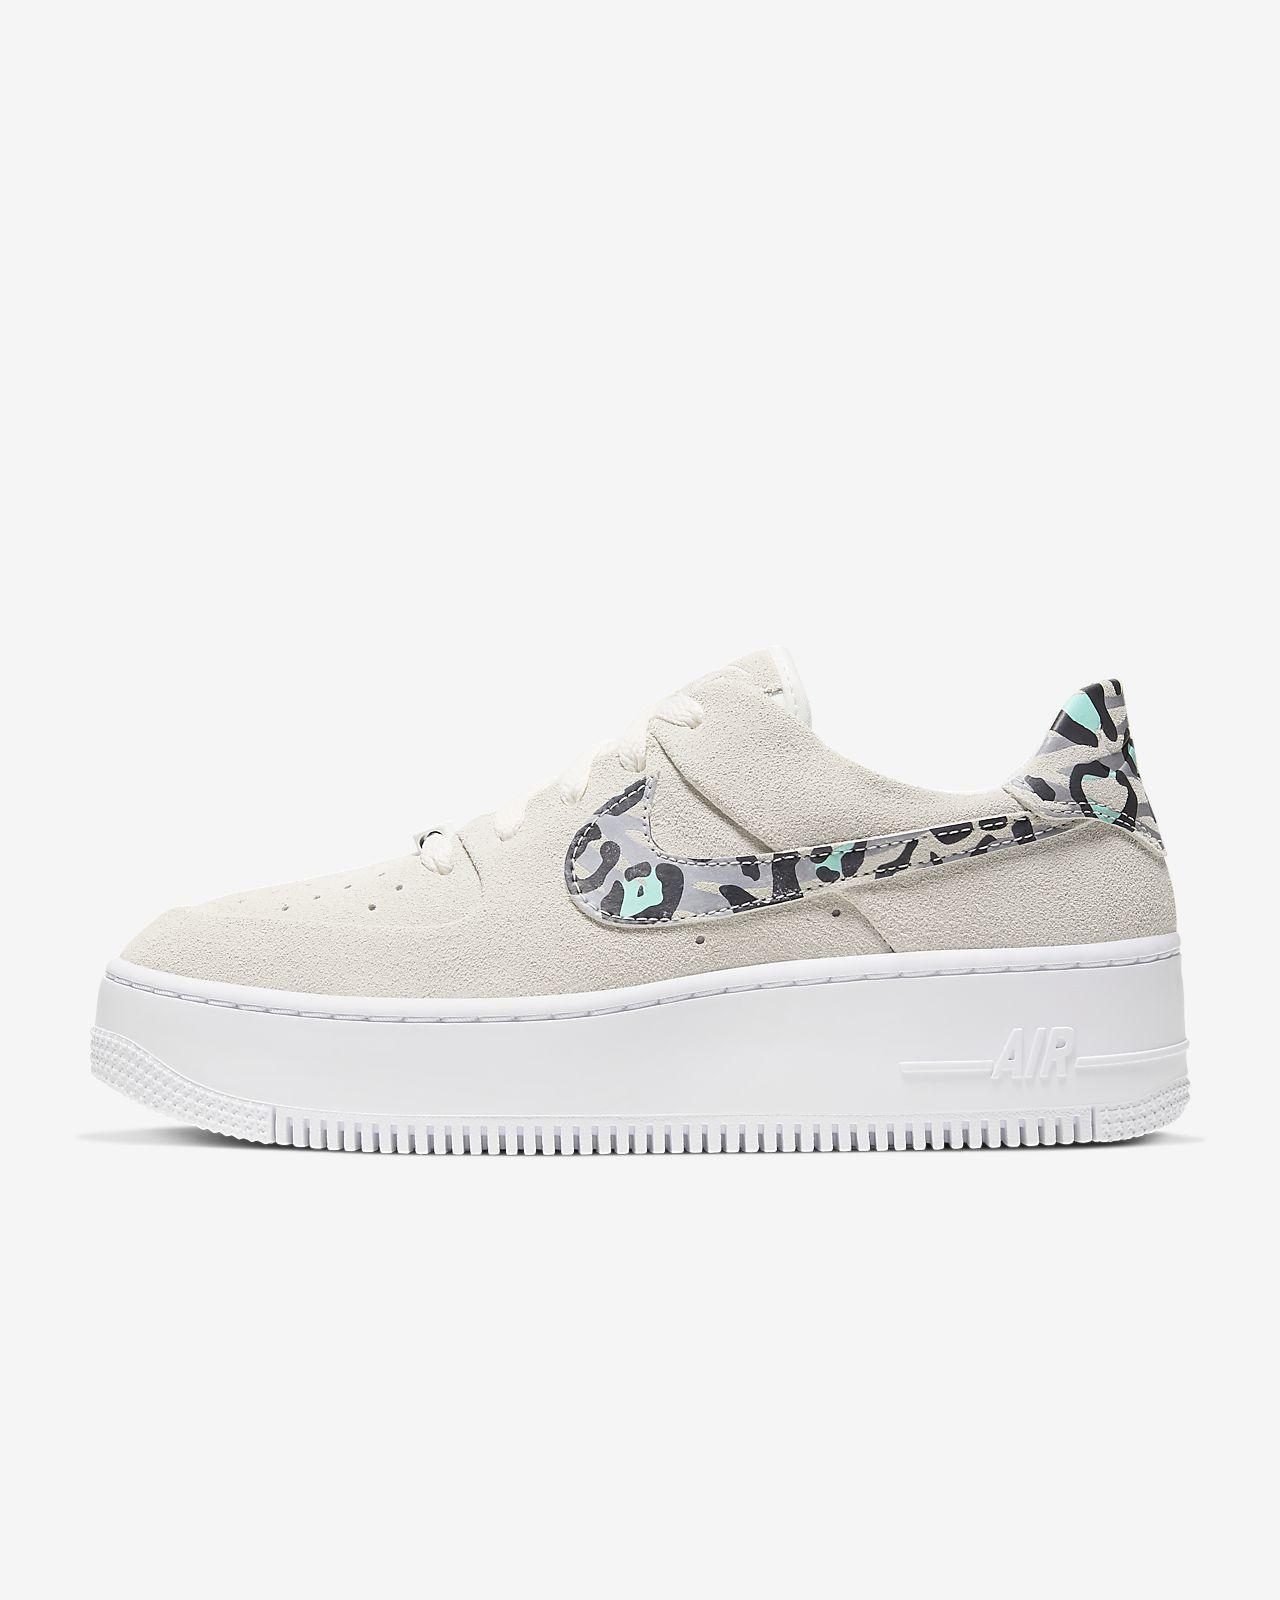 Embotellamiento Gruñido Inyección  Nike Air Force 1 Sage Low Women's Animal Print Shoe. Nike GB   Nike air  force, Animal print shoes, Nike air